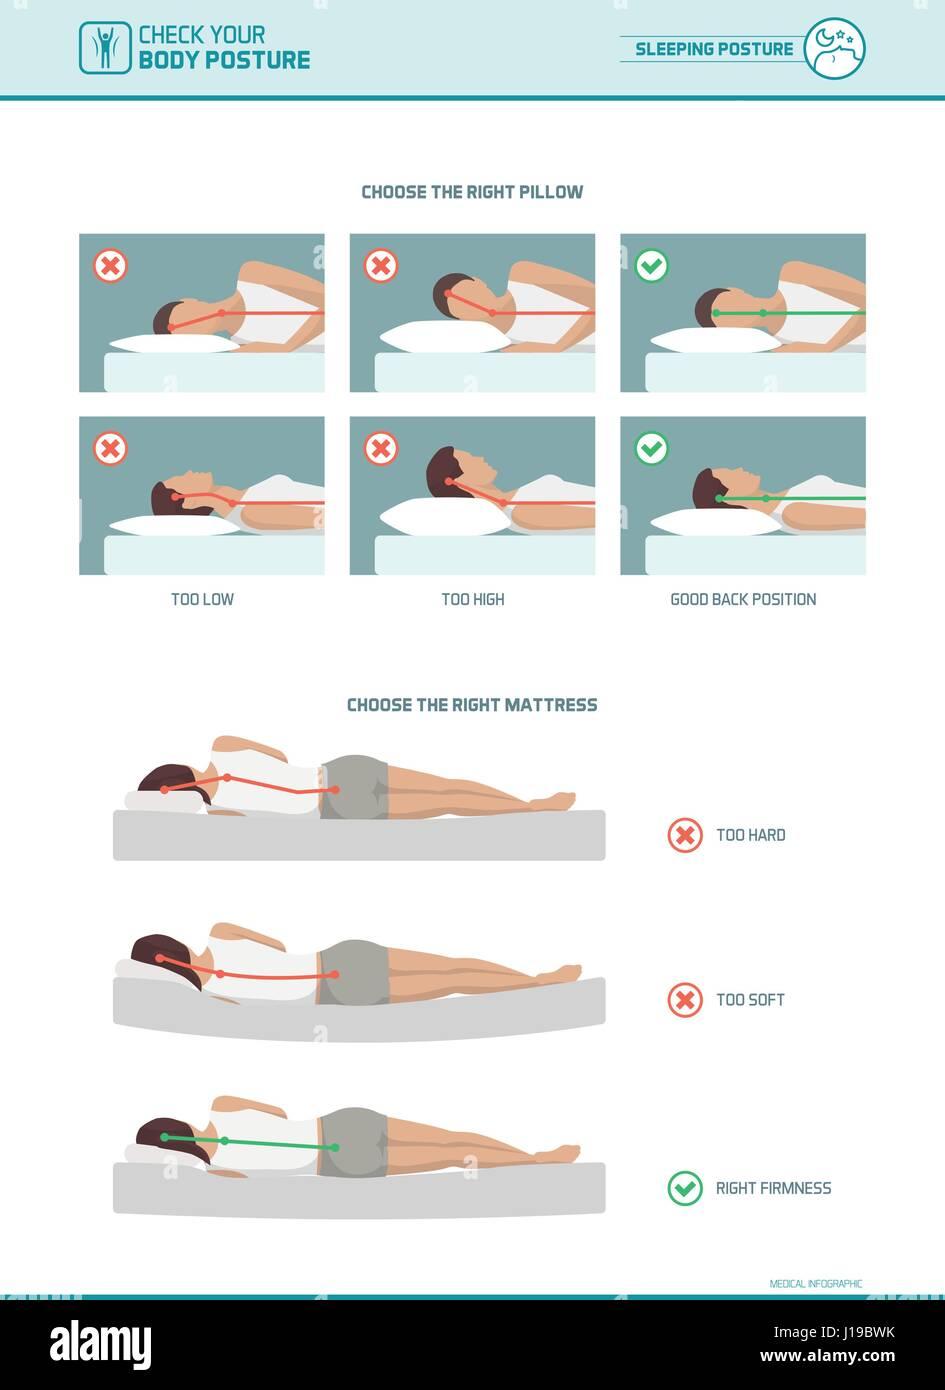 Correct Sleeping Ergonomics And Body Posture Mattress And